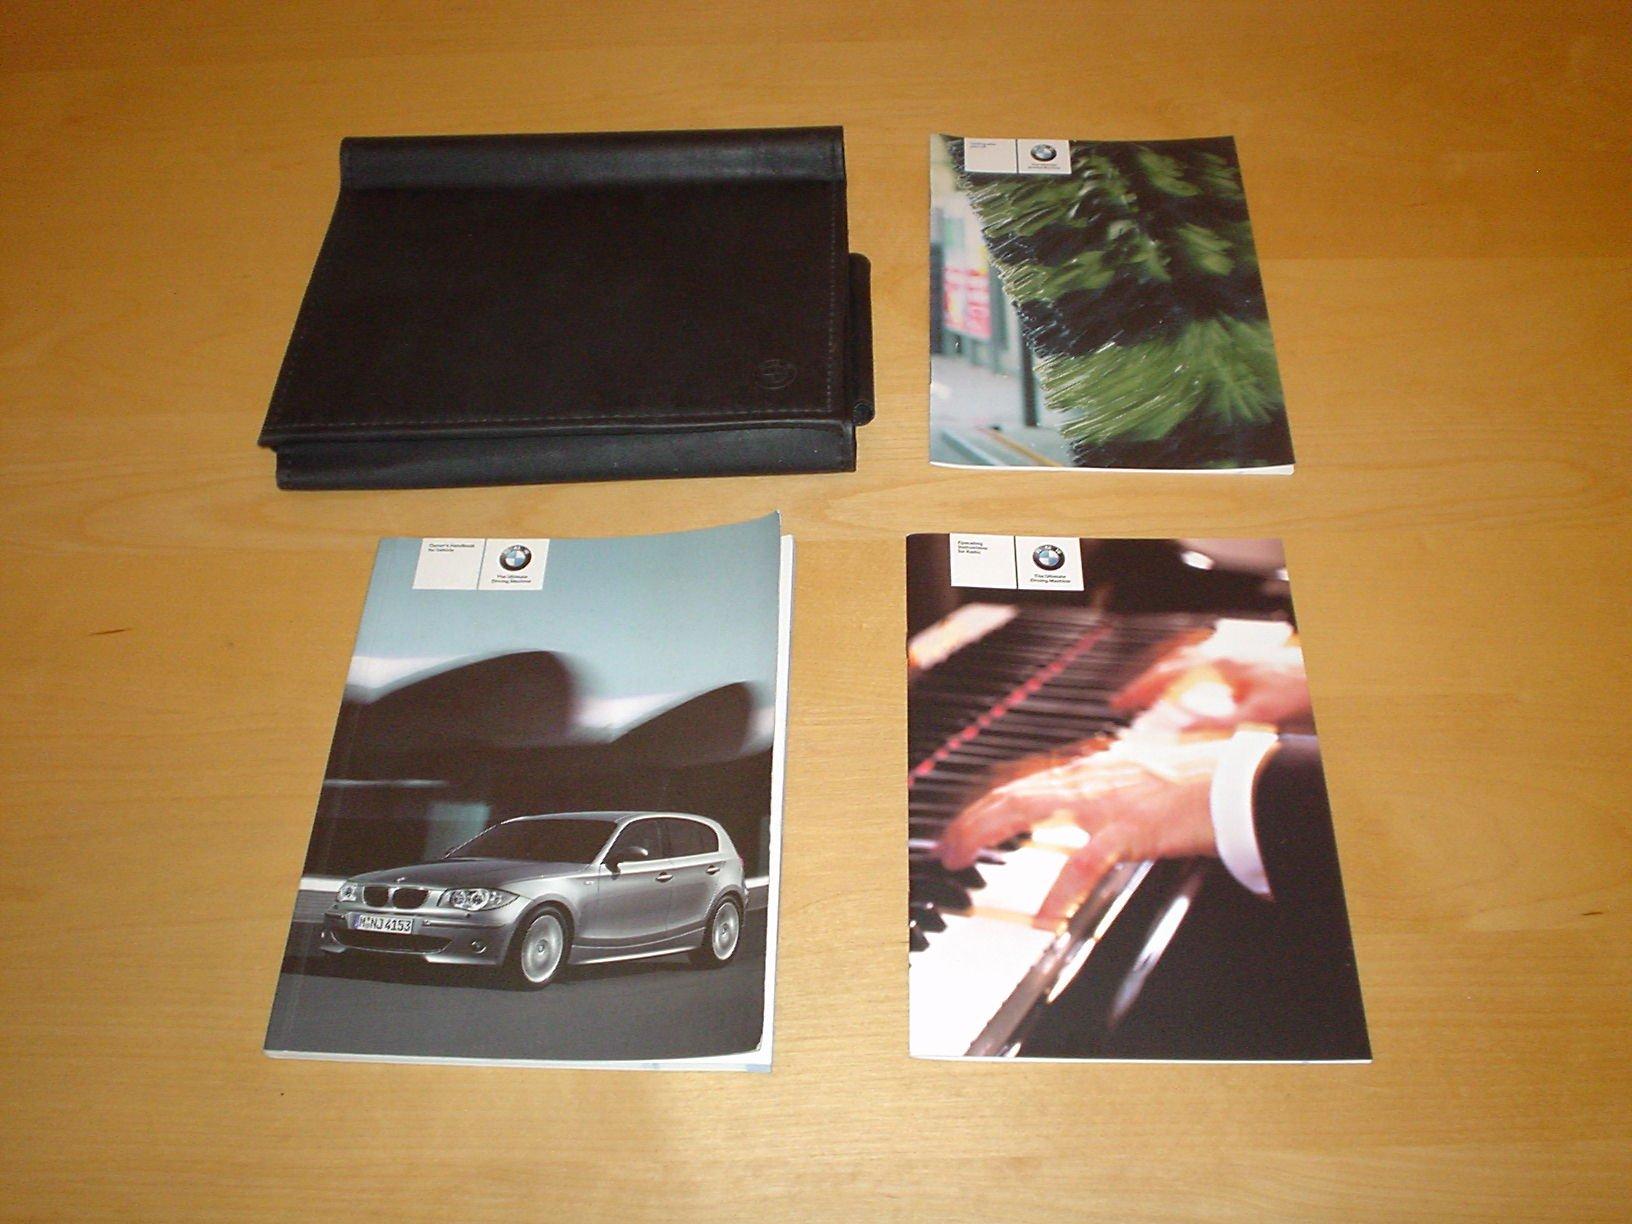 2011 bmw 1 series manual